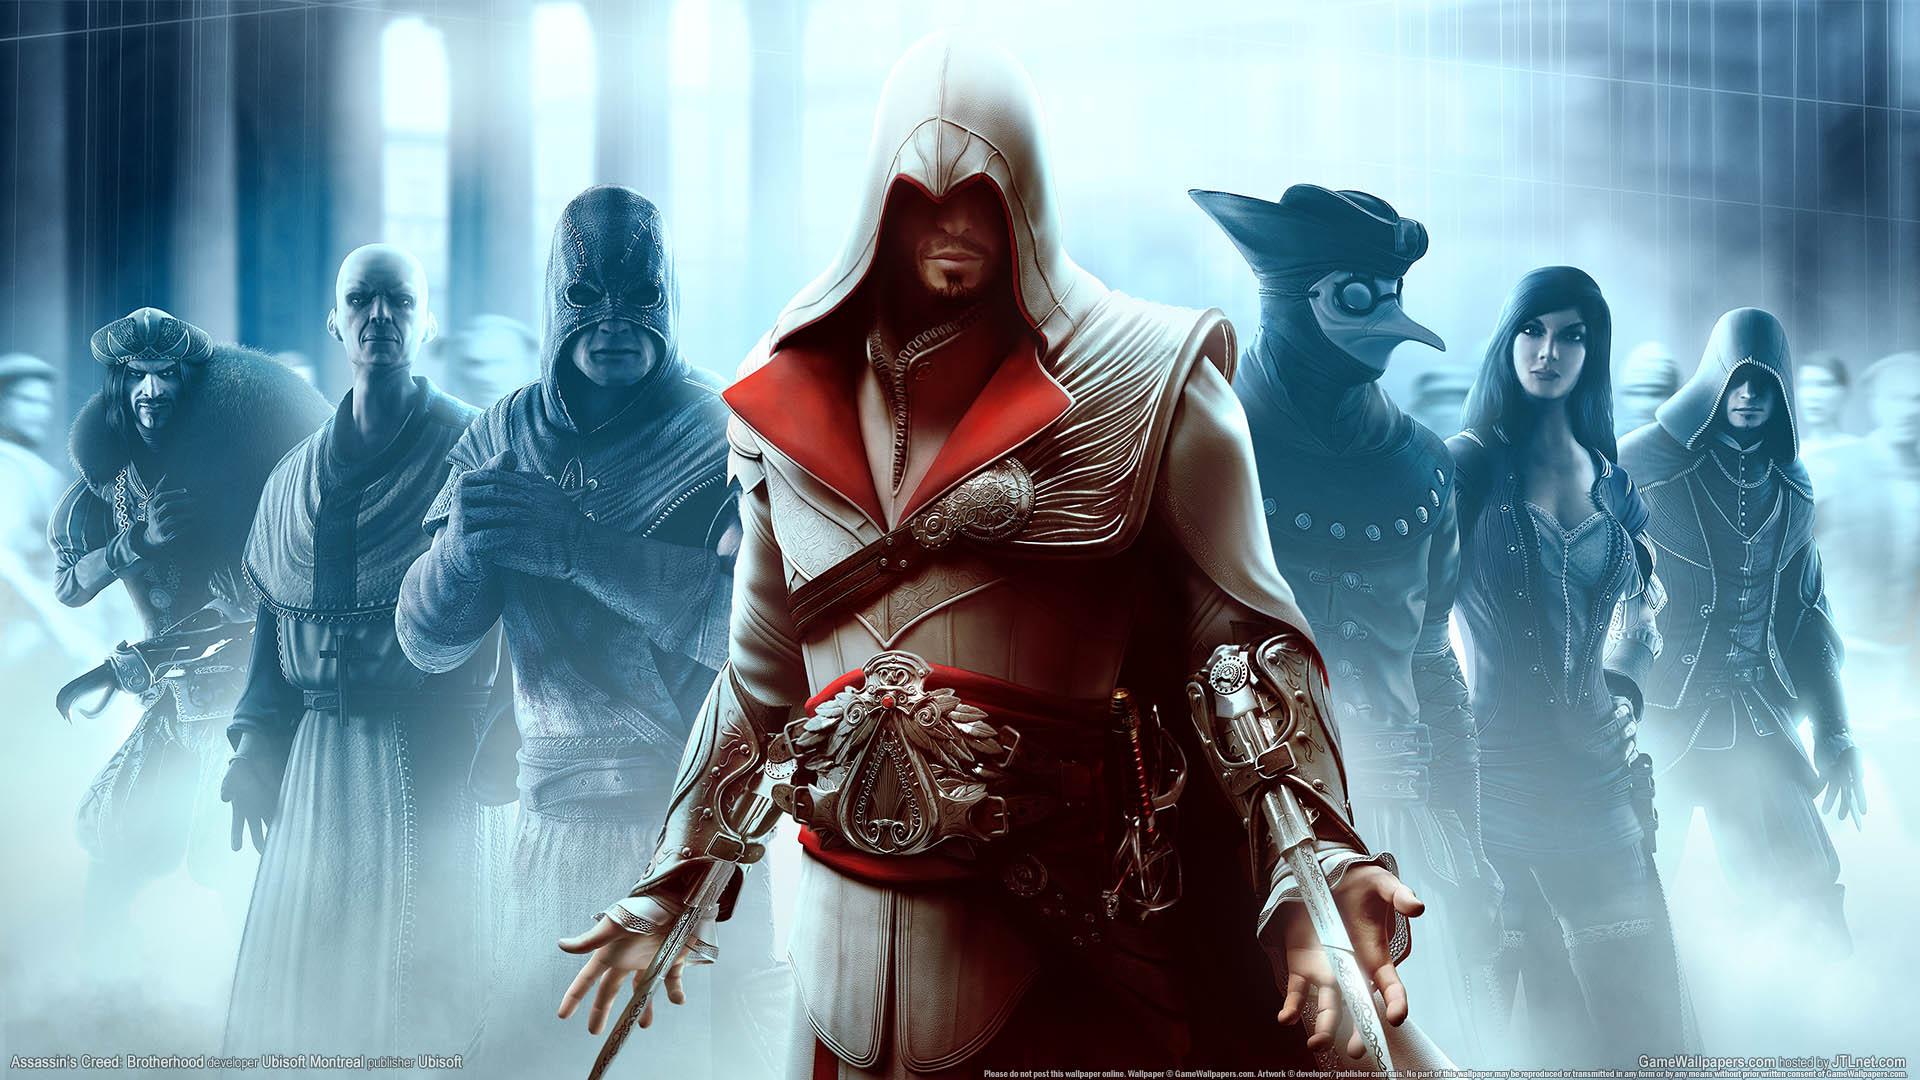 Assassin's Creed: Brotherhood wallpaper 01 1920x1080